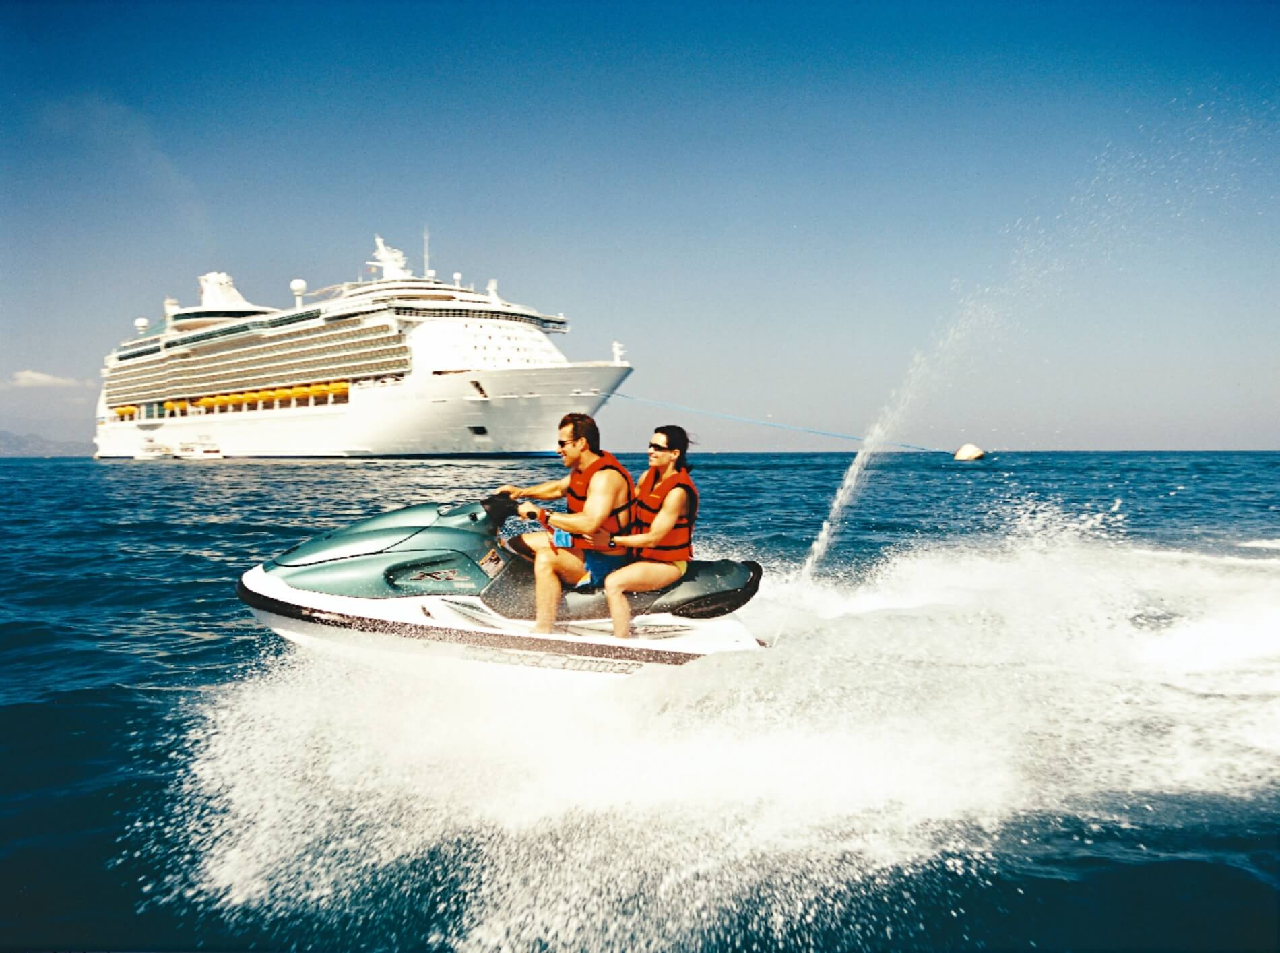 Круизный лайнер Navigator of the Seas - Водный мотоцикл (Jetski)